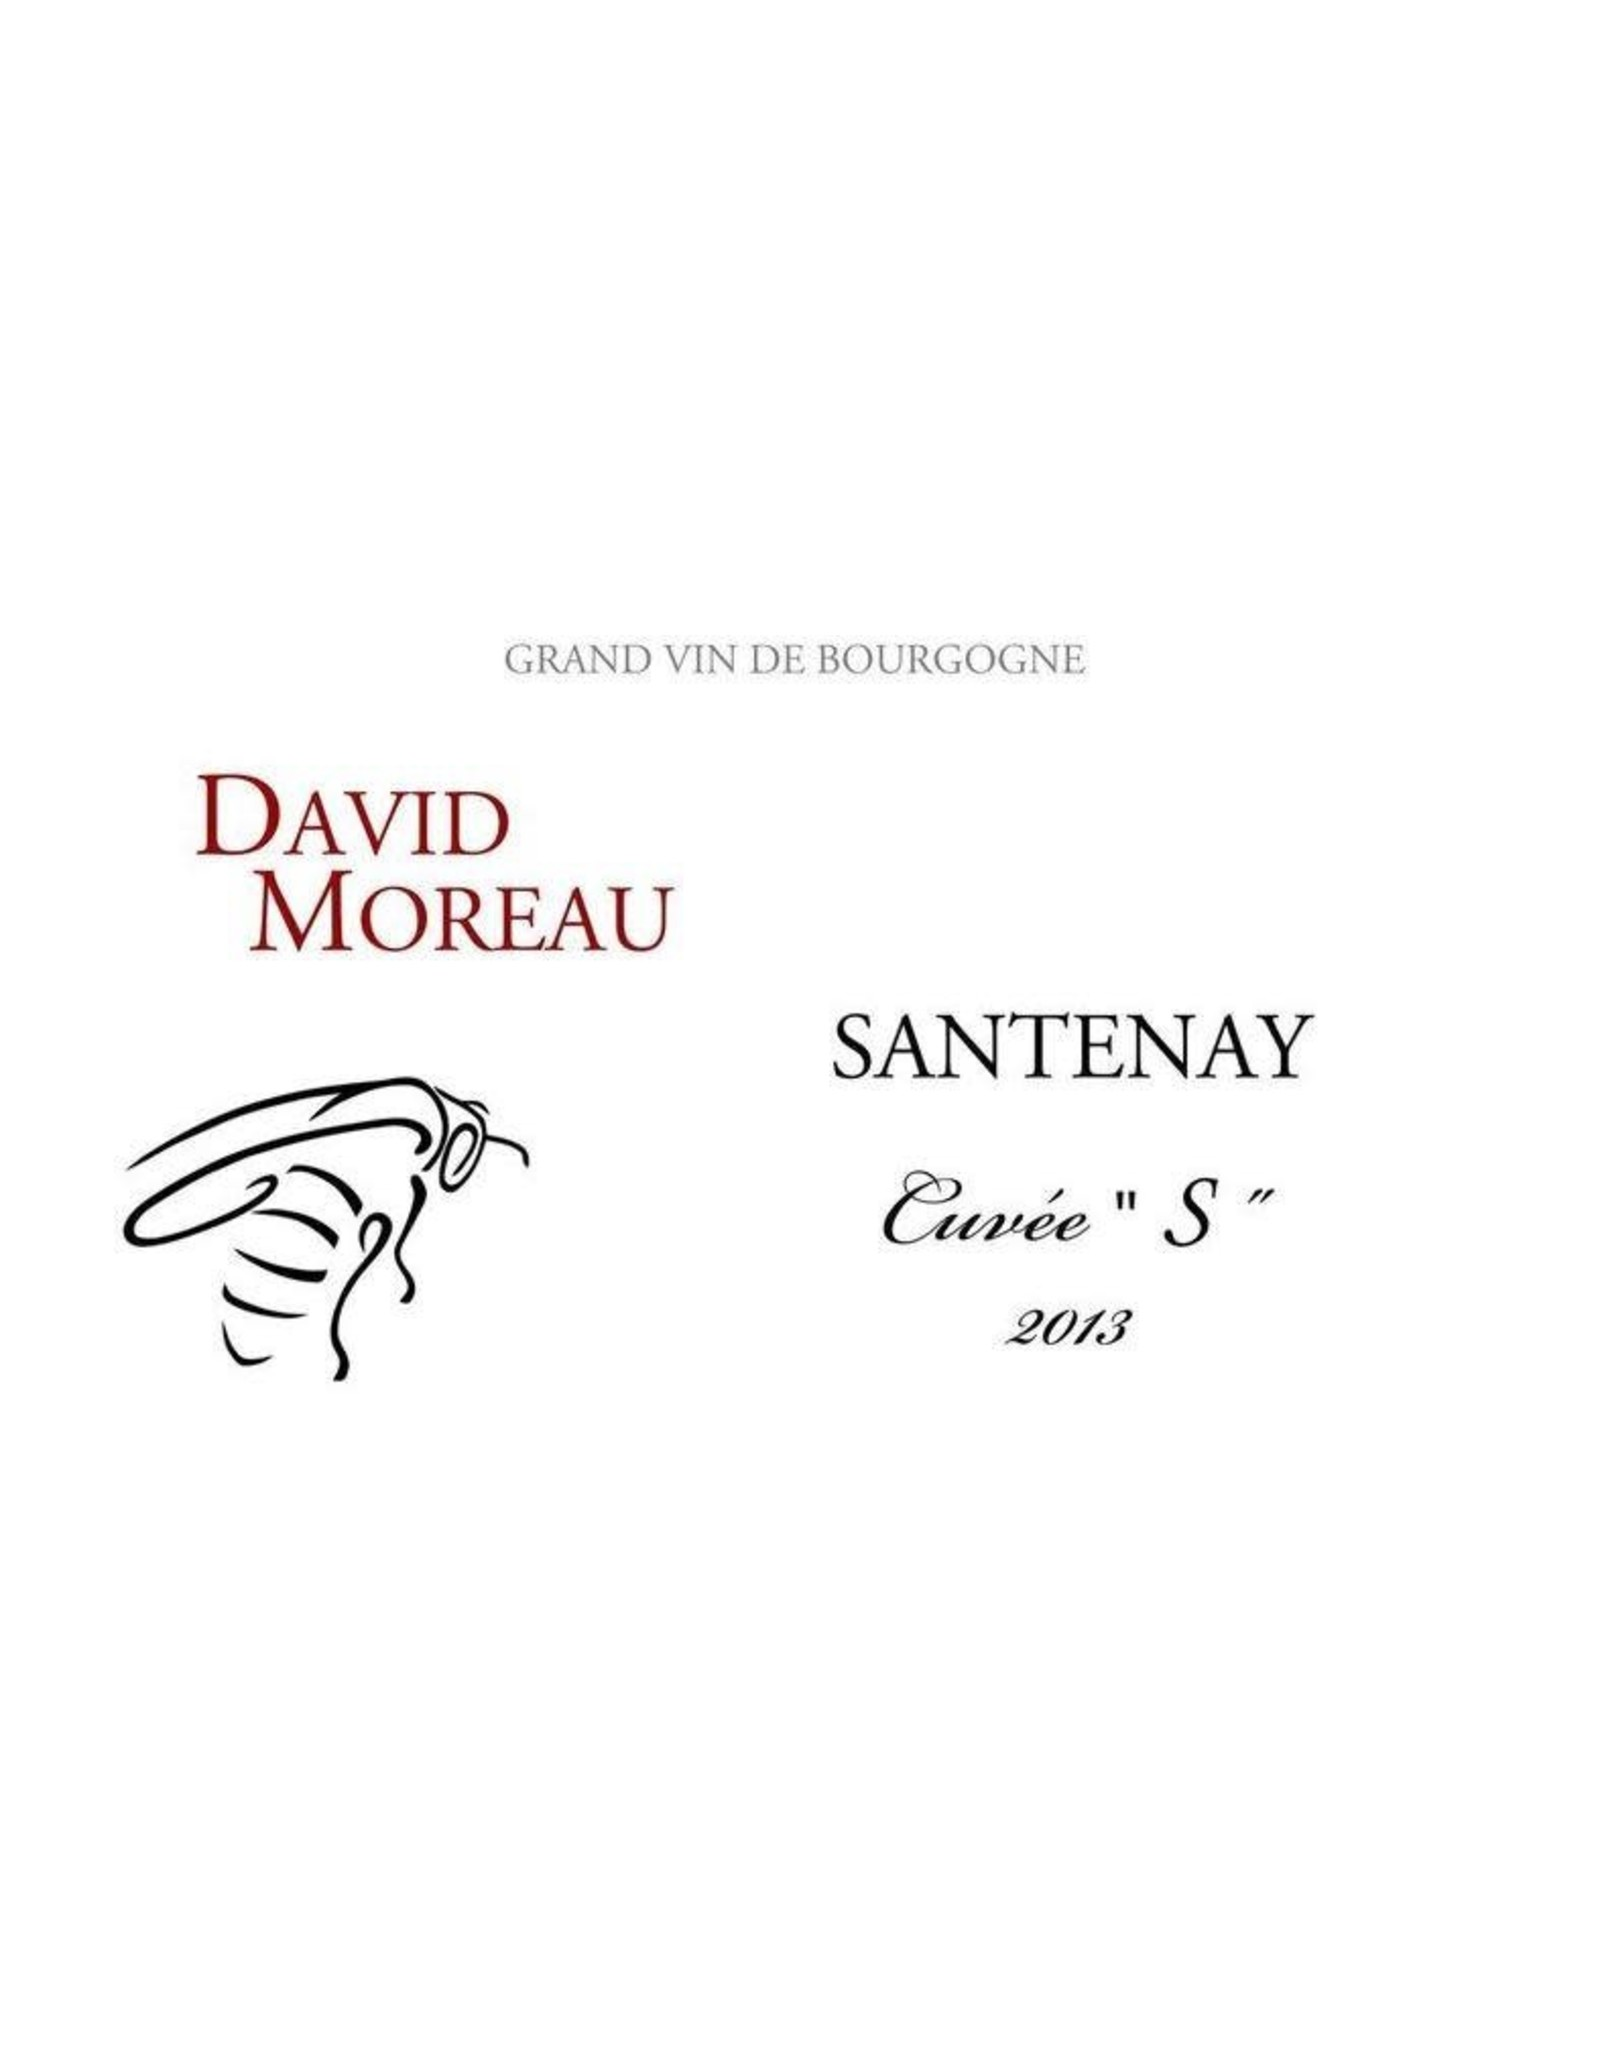 David Moreau David Moreau Santenay Cuvee S (2014)